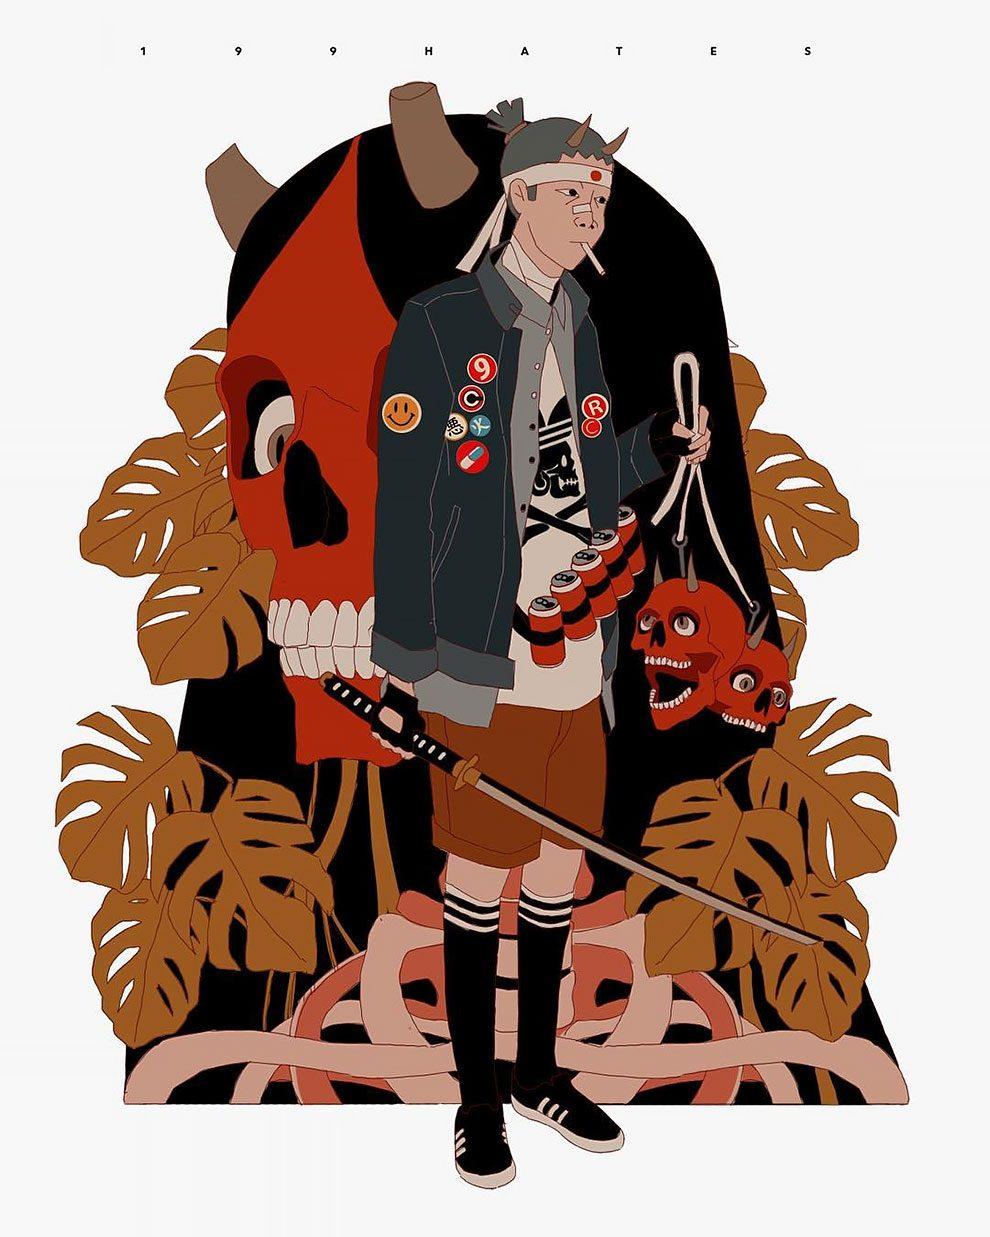 Potato Wallpaper Cute Streetwear Illustrations Dive Into A Dystopian World Of